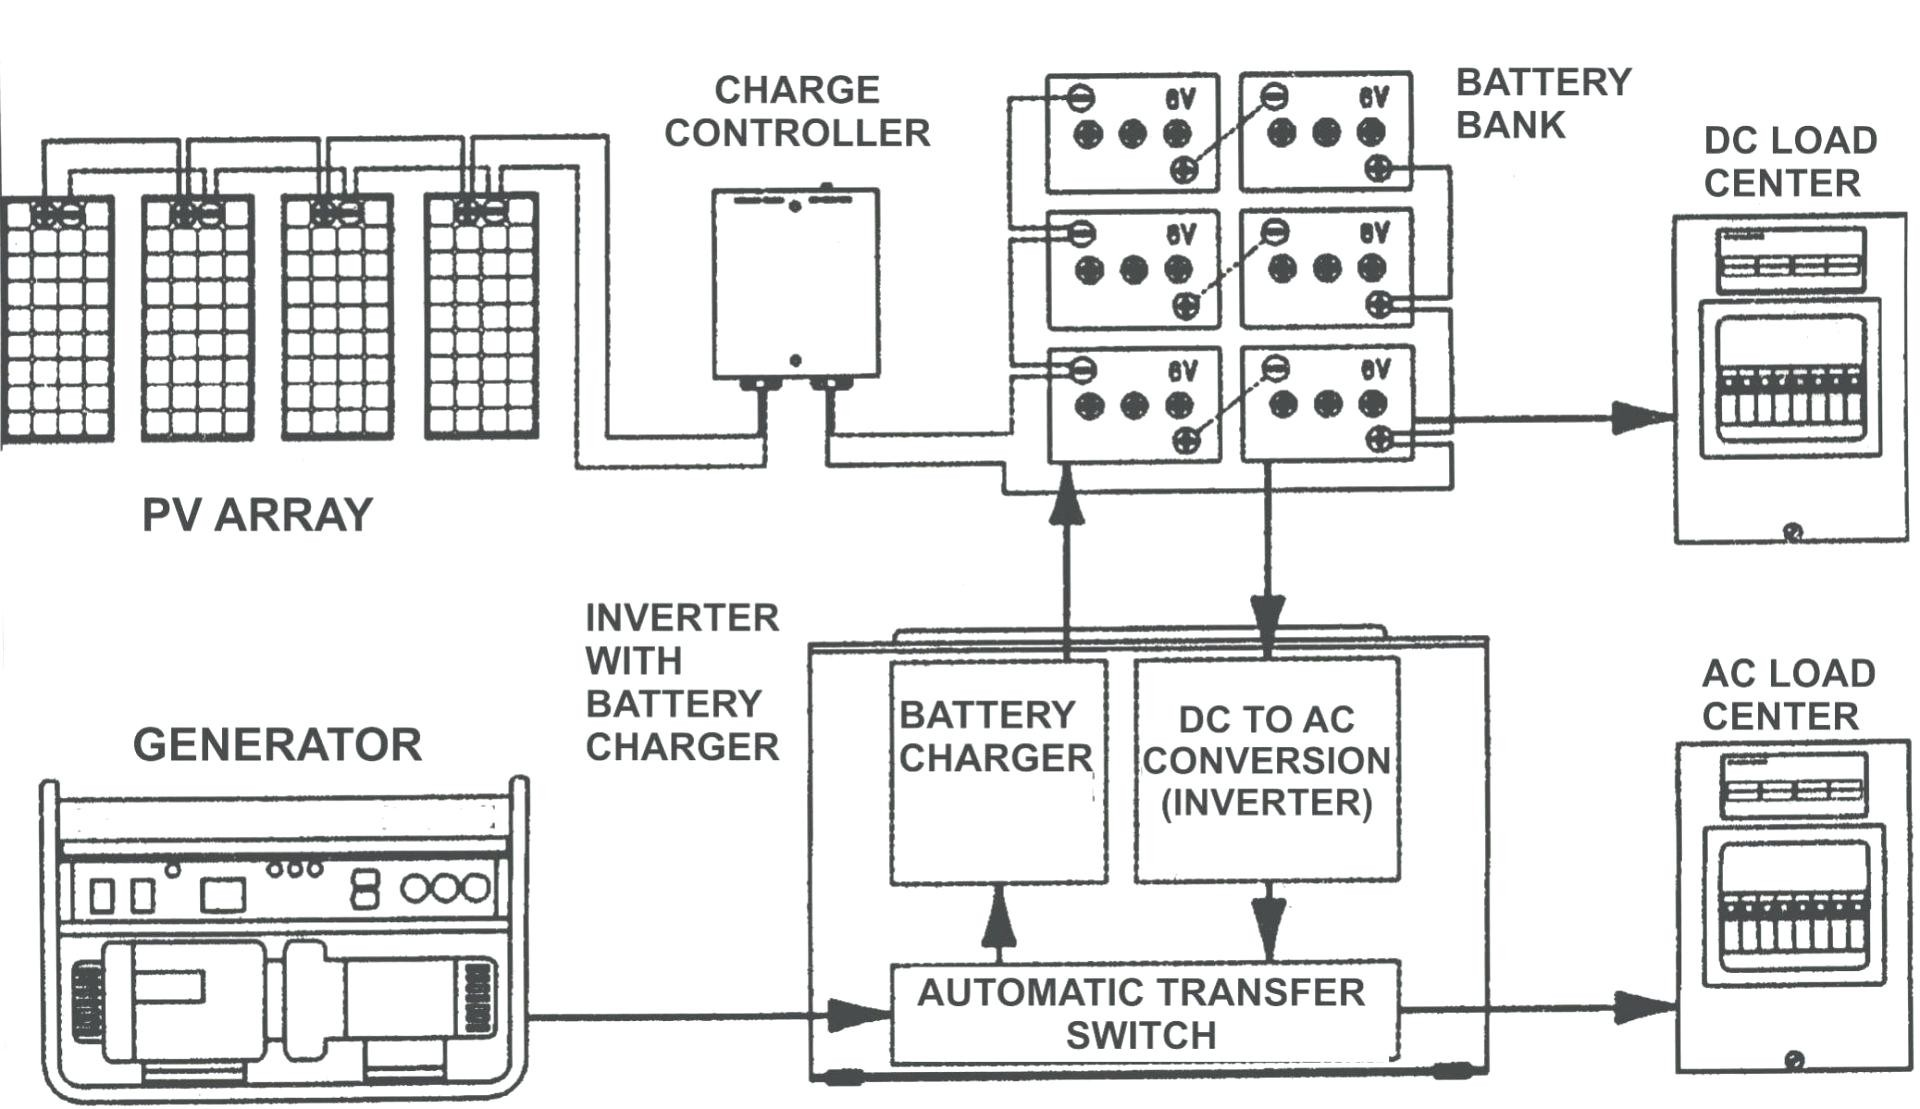 Marine Battery Inverter Diagram Trusted Wiring Caravan Charger Dc Solutions Digital Schematics